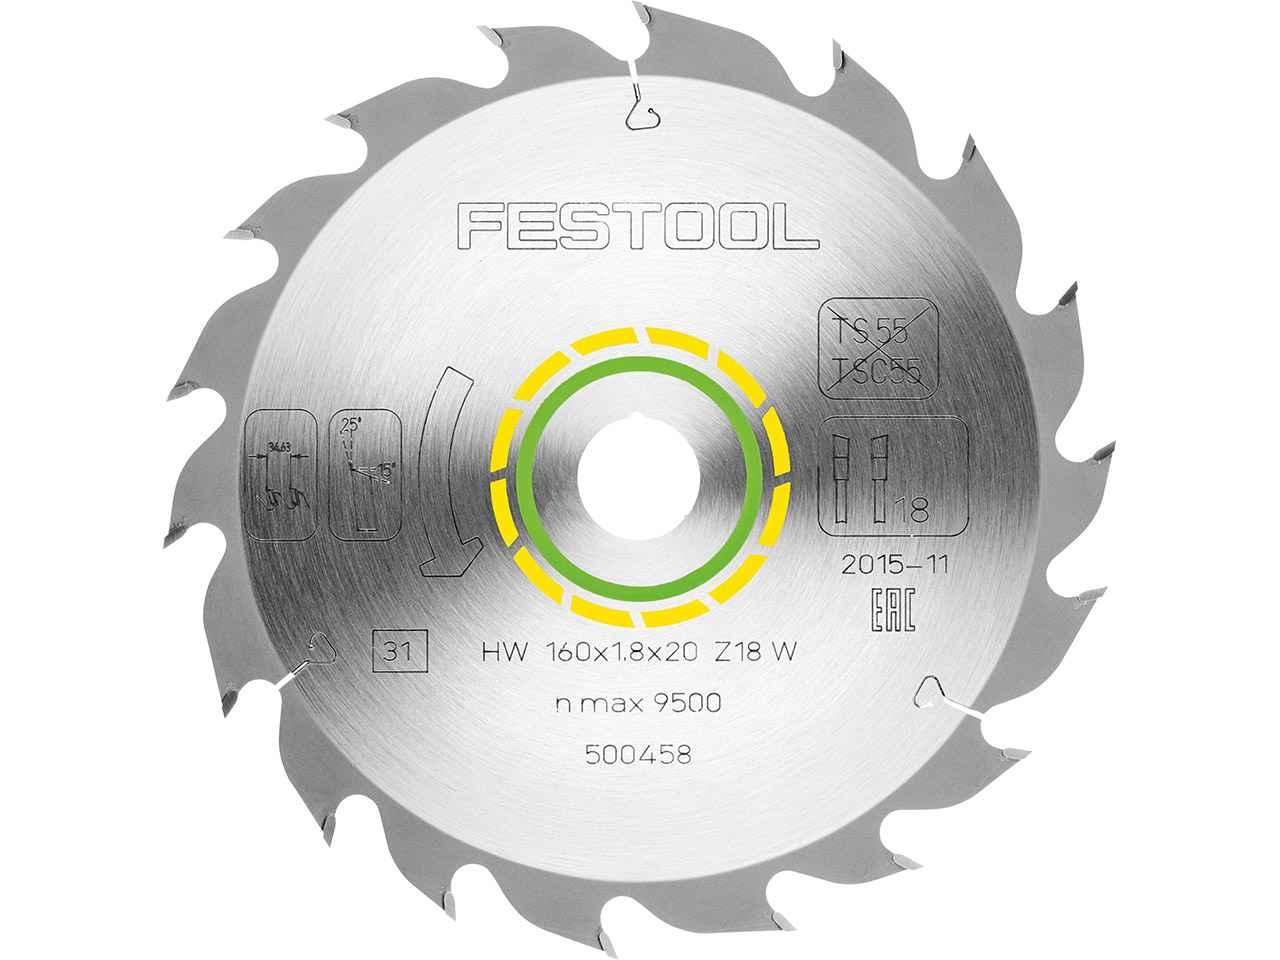 Festool_500458.jpg